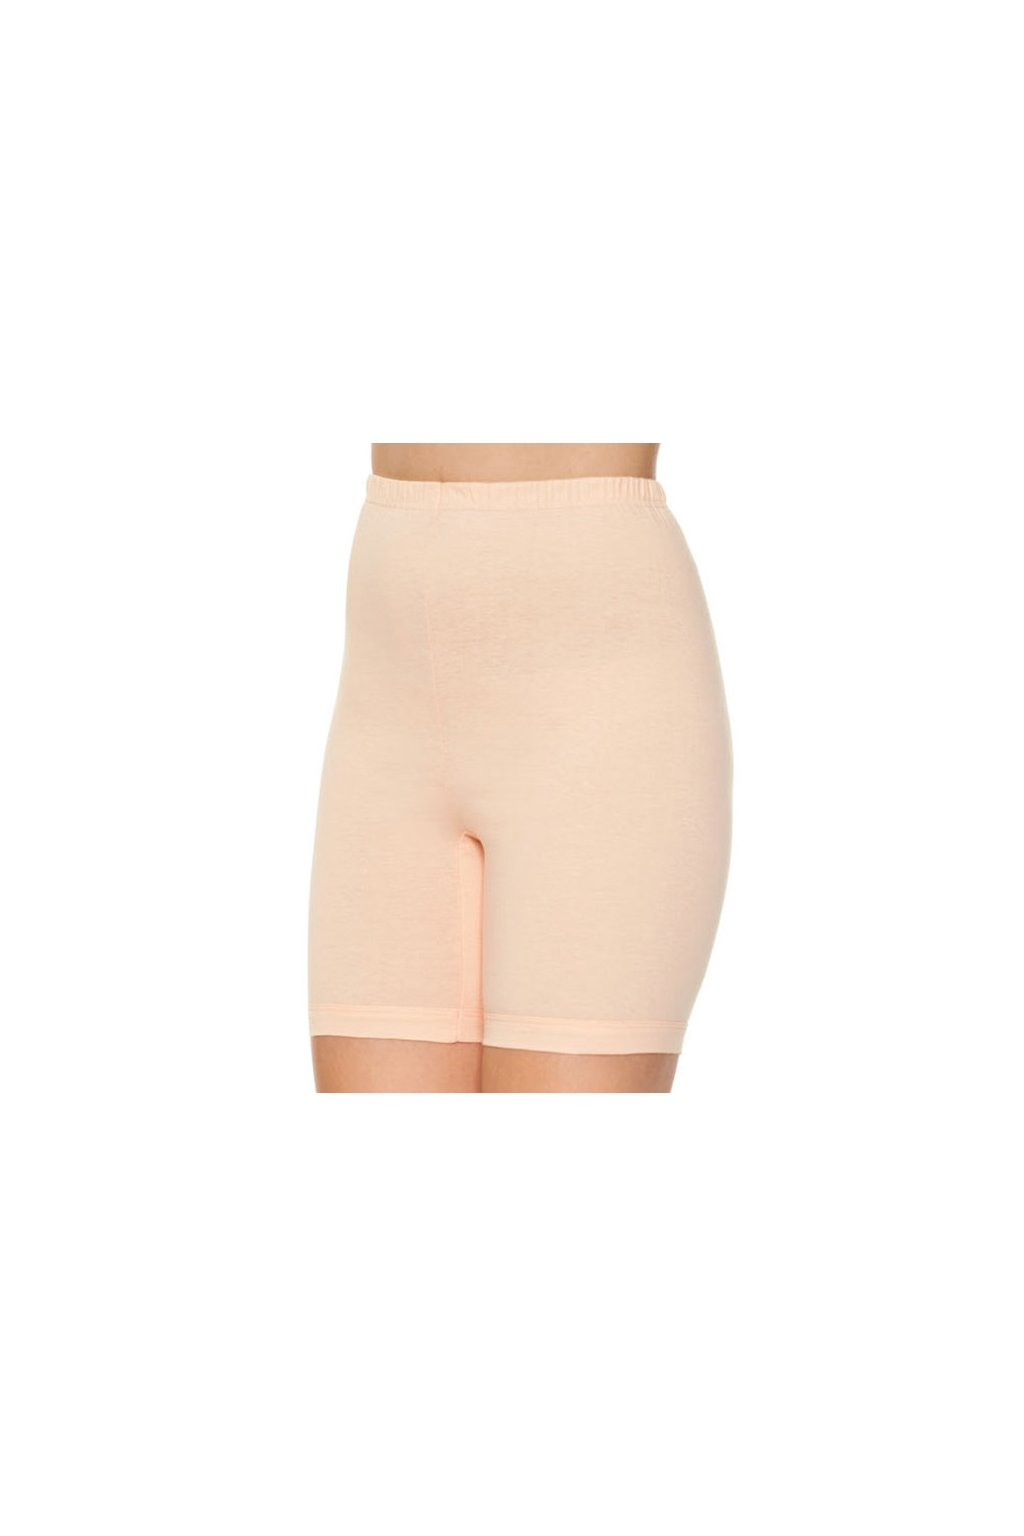 Nohavičkové kalhotky hladké, 10017 510, mix barev